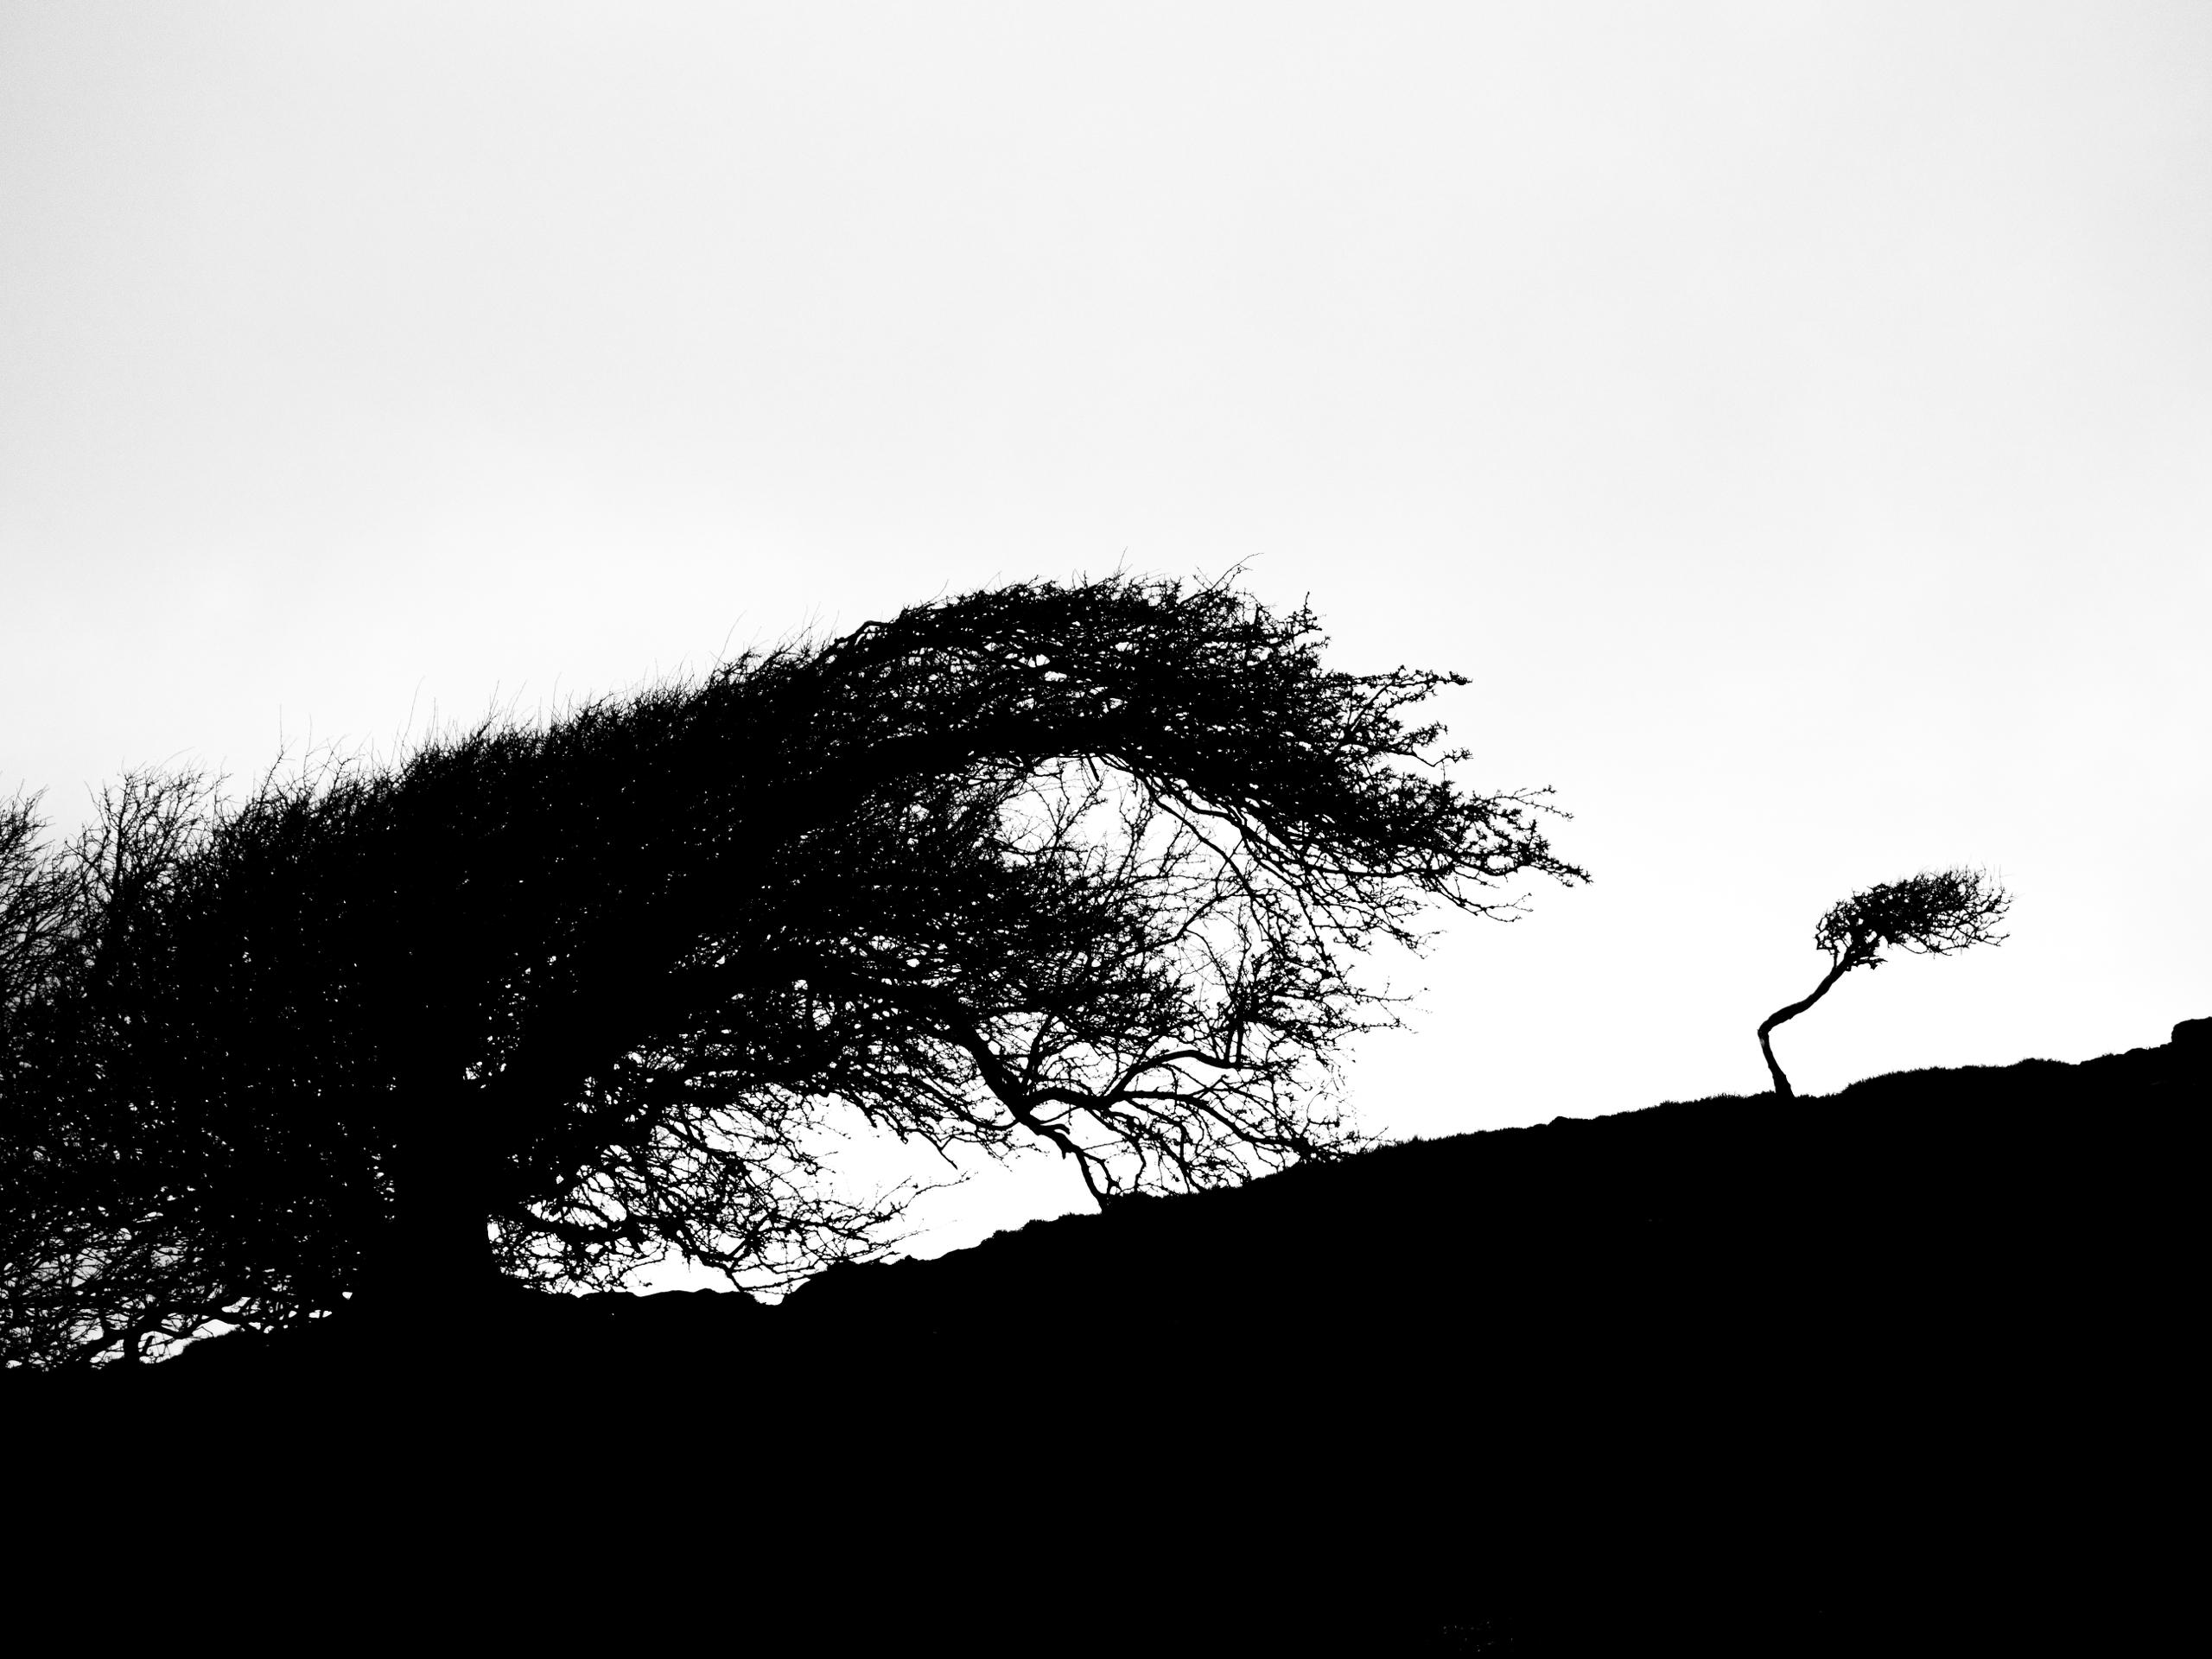 Wind-blown - stevemallett | ello